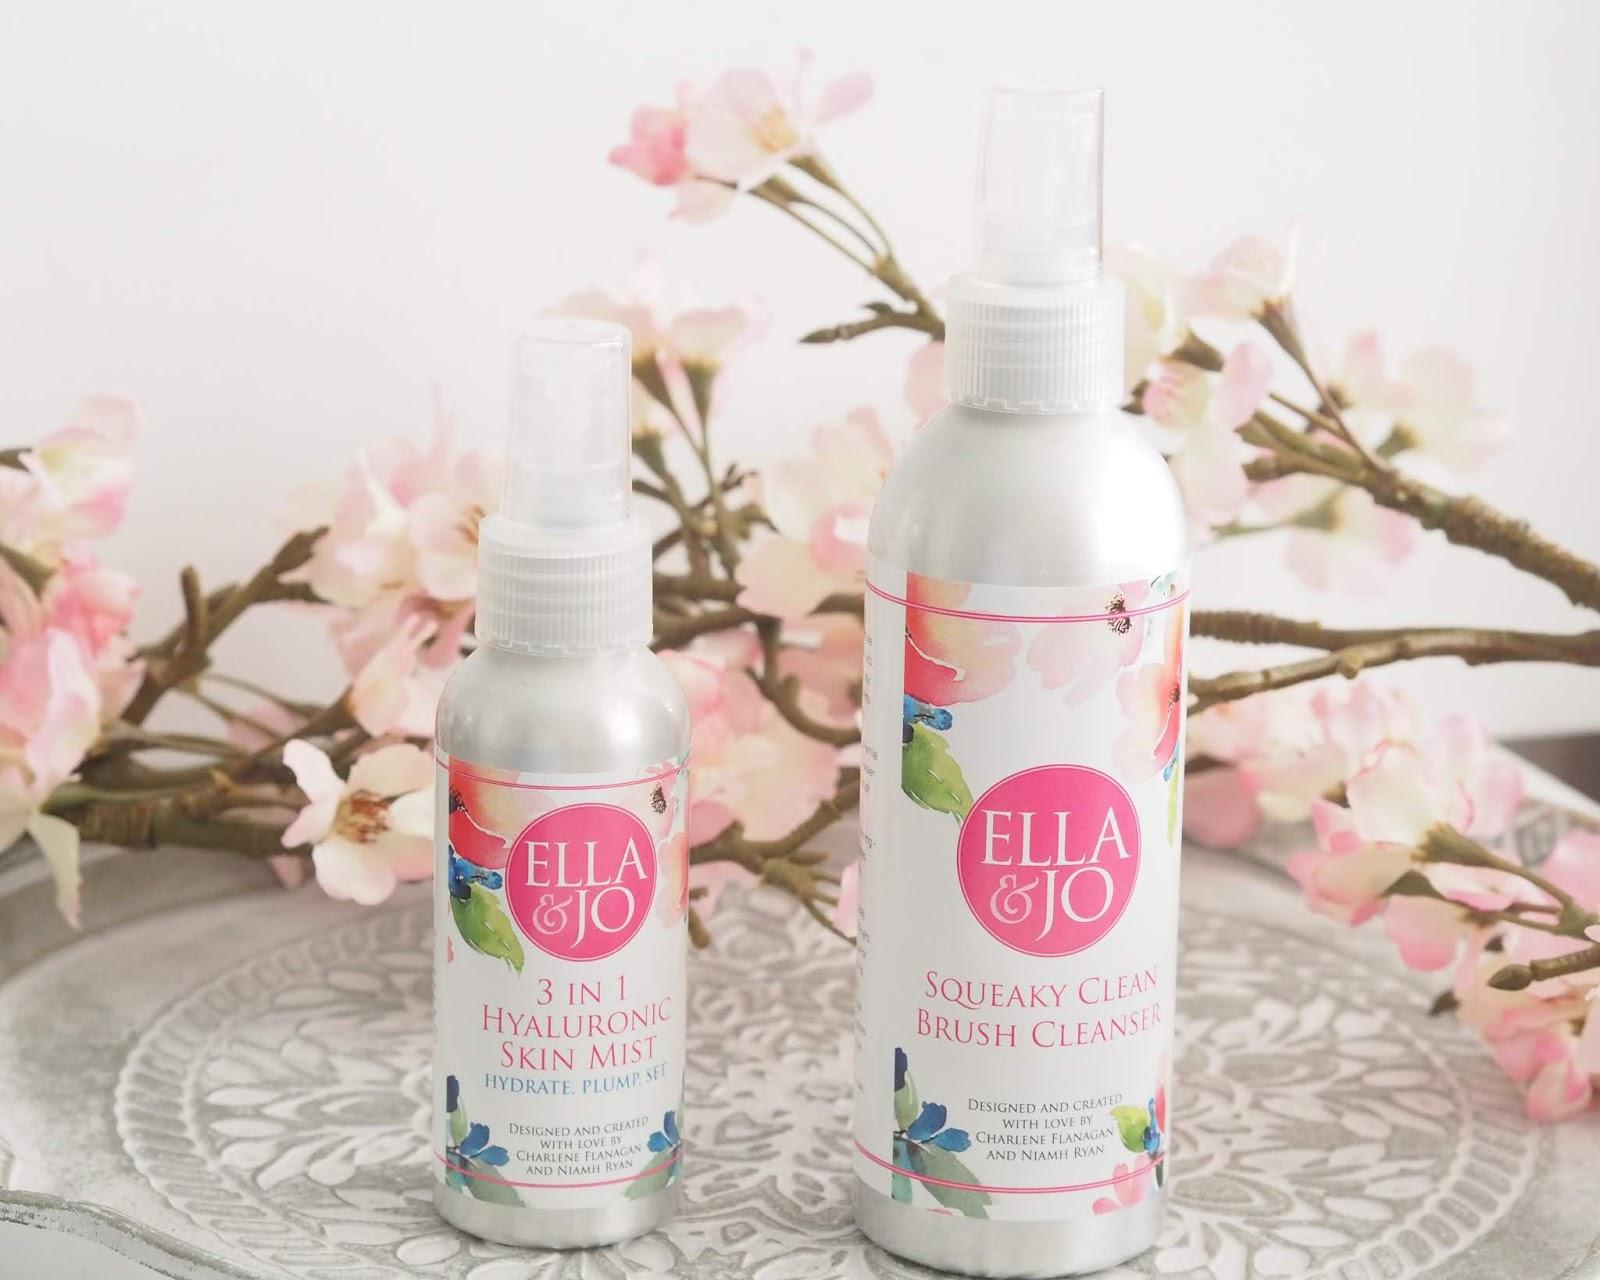 Ella & Jo Squeaky Clean Brush Cleanser & 3 in 1 Hyaluronic Skin Mist review!